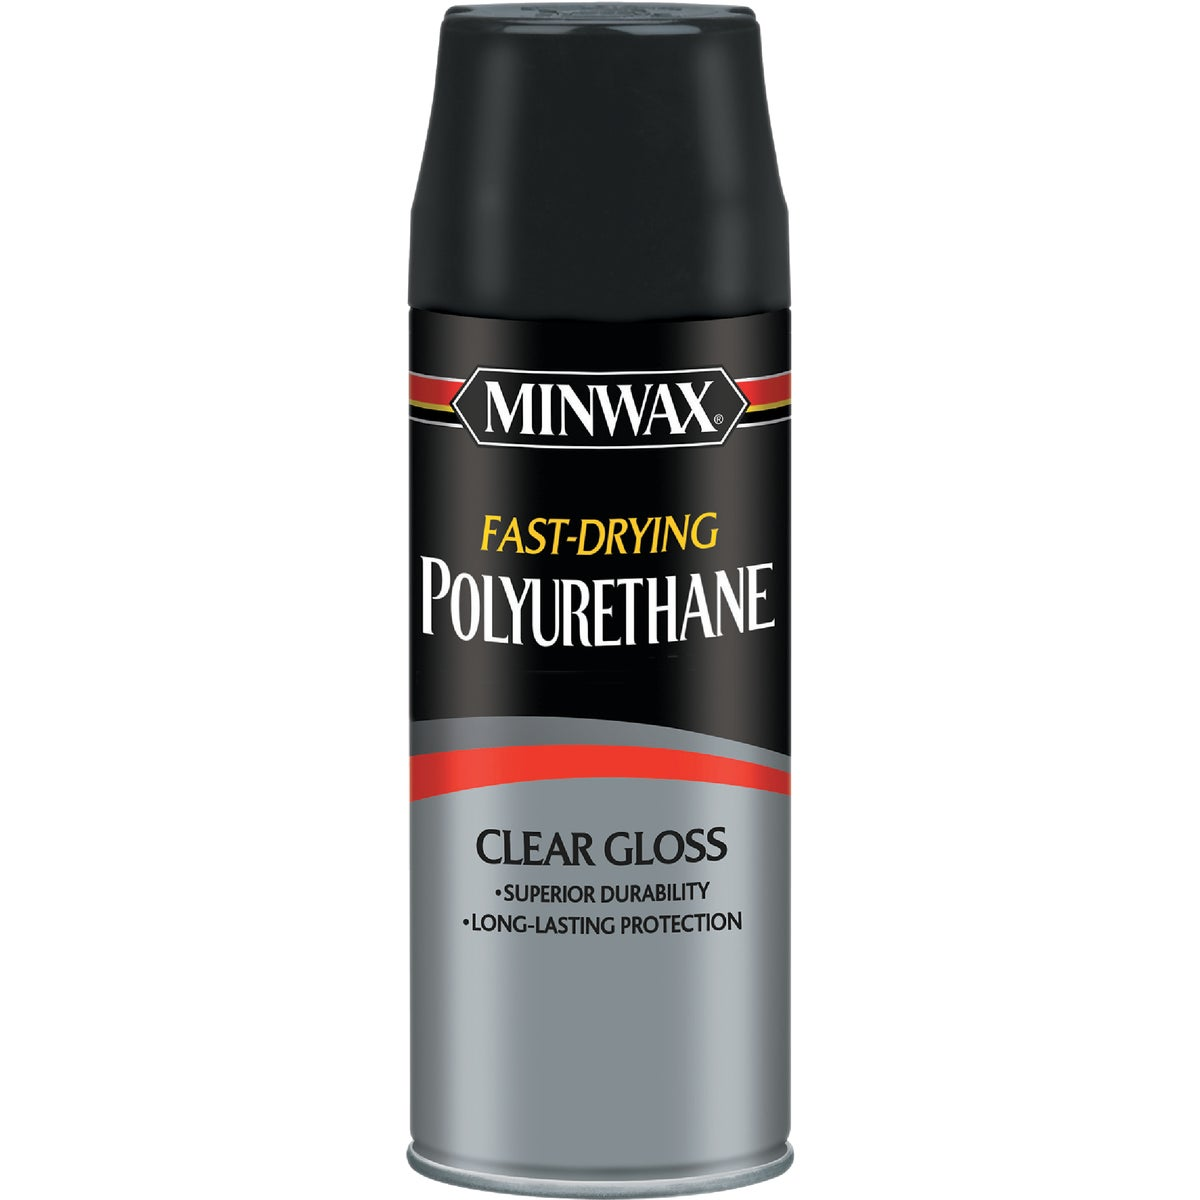 Minwax 33050 Fast-Drying Polyurethane Aerosol, Gloss Finish